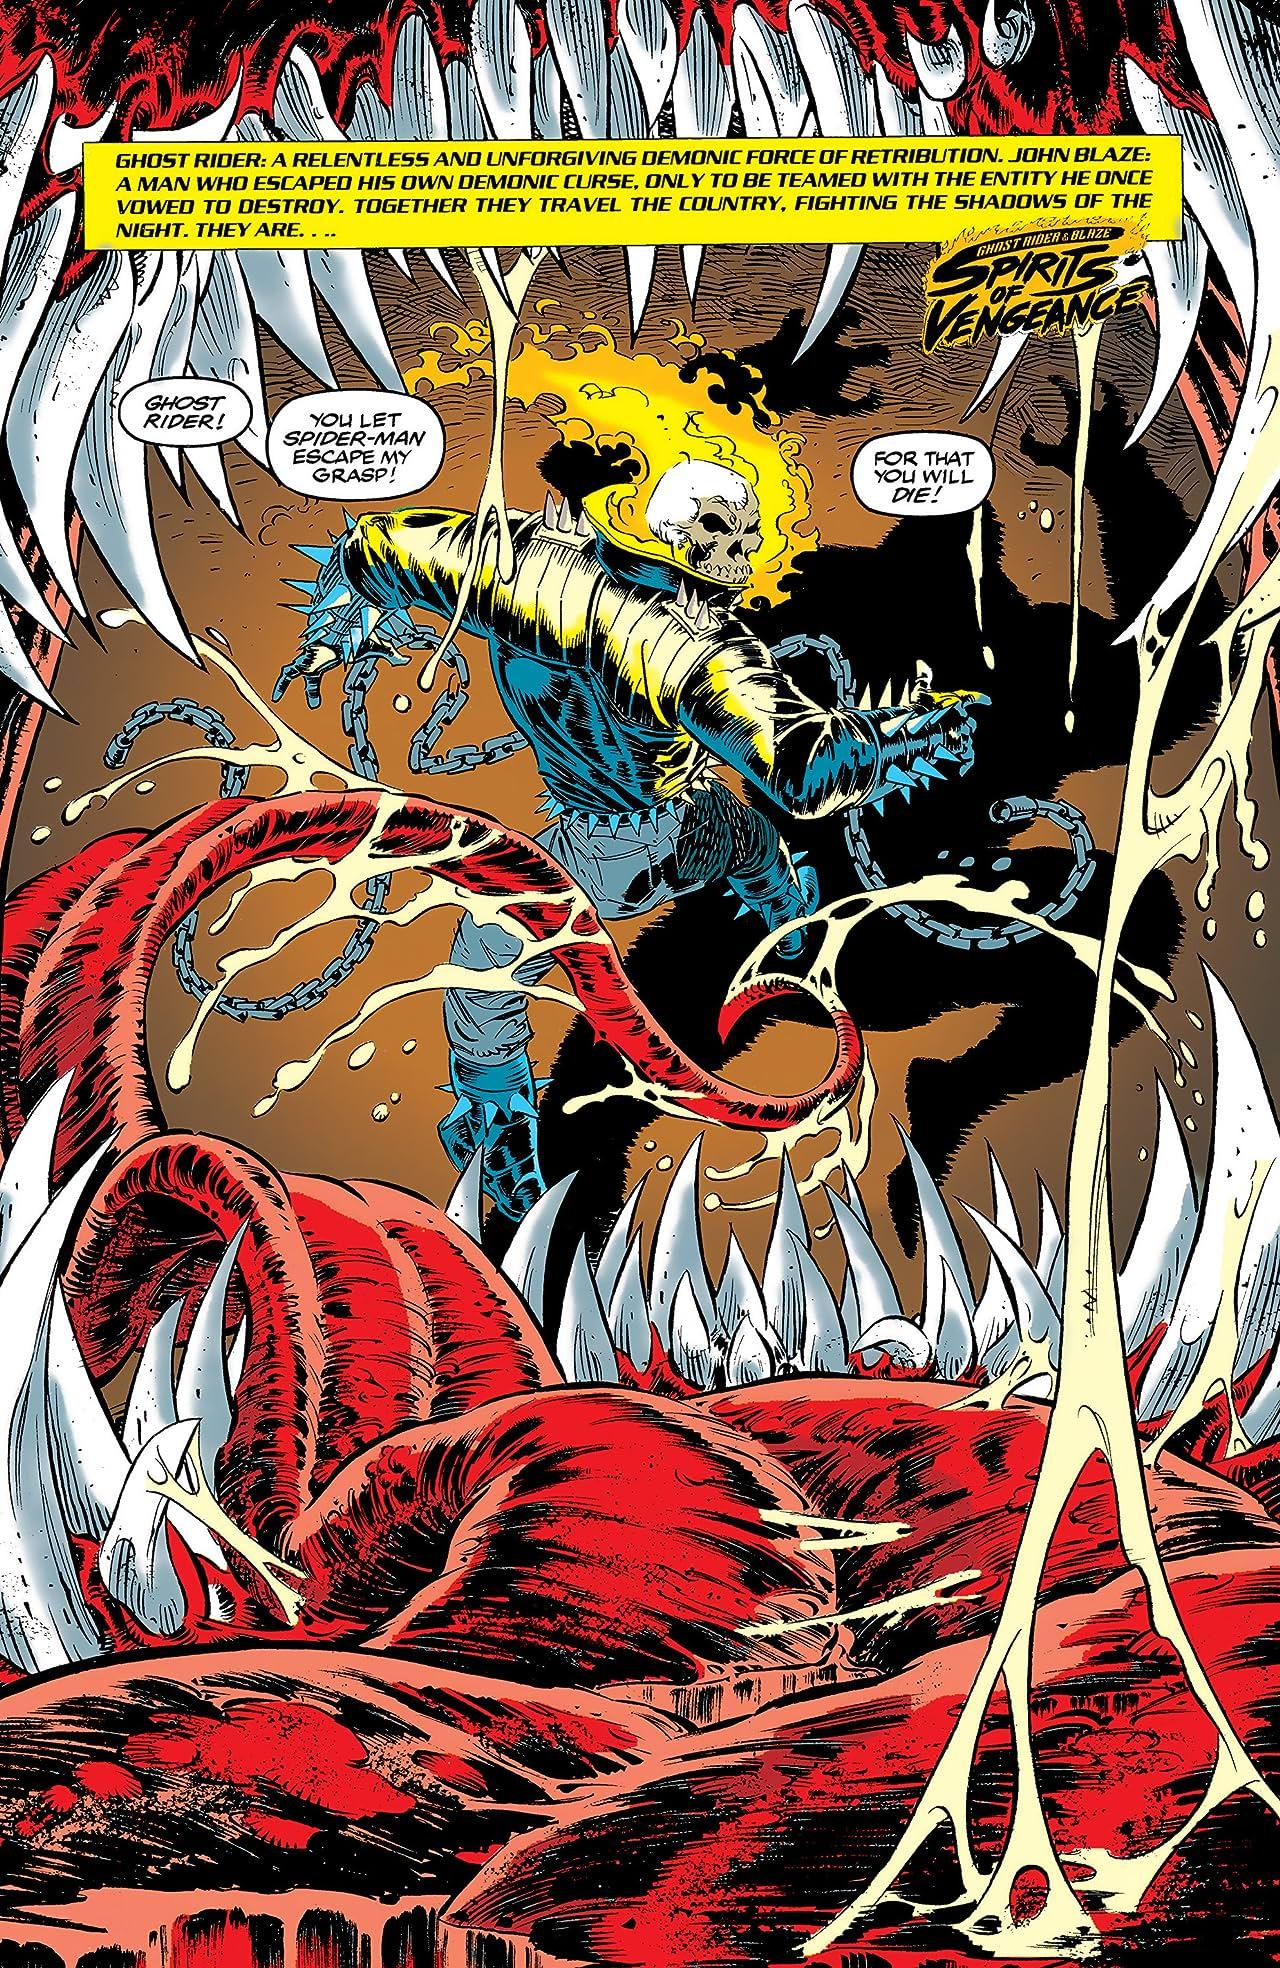 Ghost Rider/Blaze: Spirits of Vengeance (1992-1994) #6